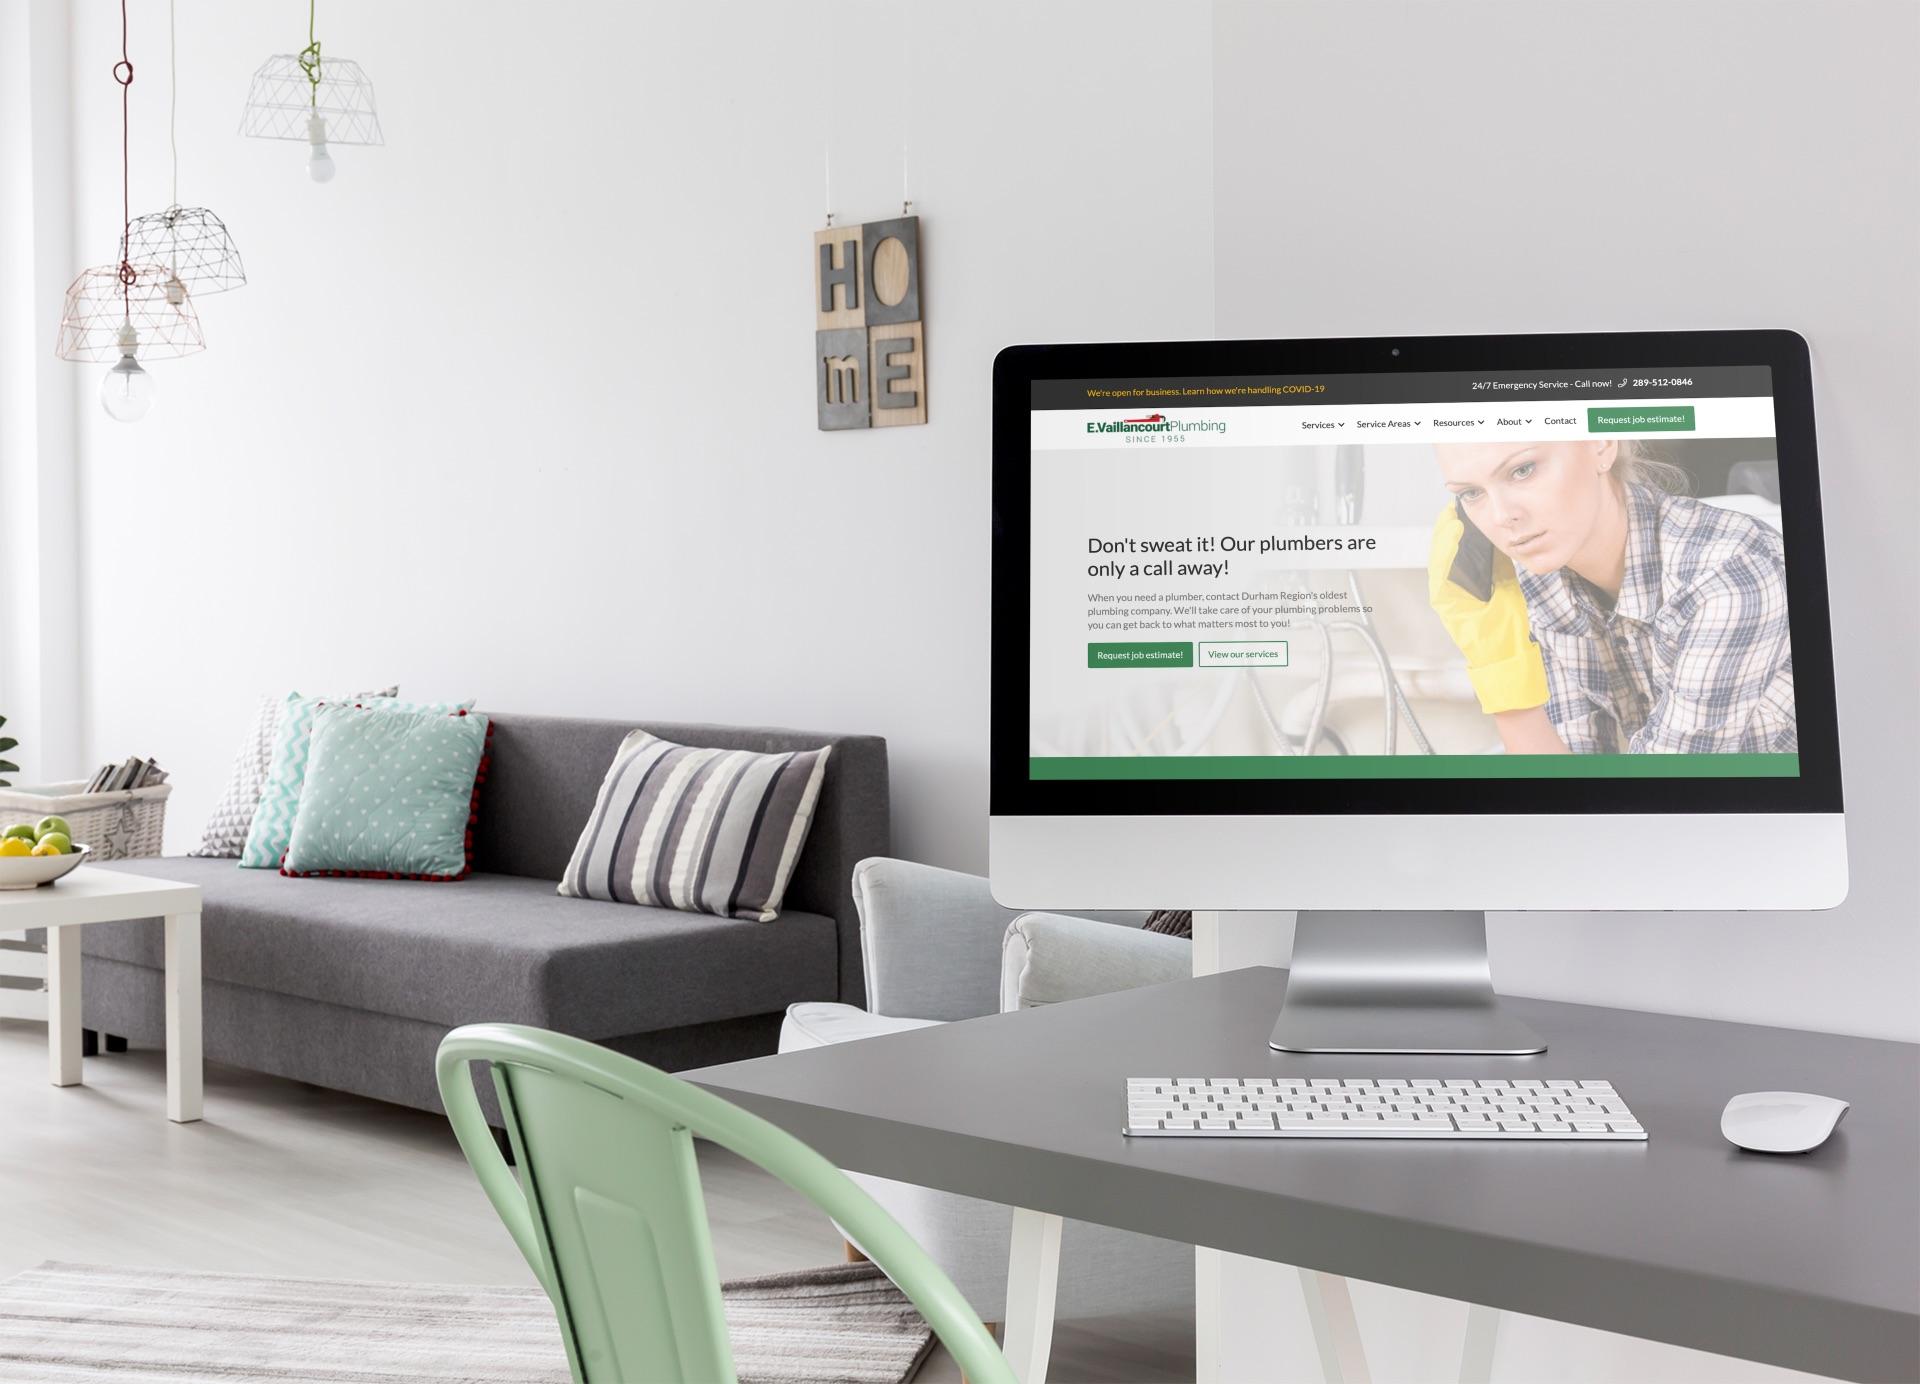 iMac on desk displaying vaillancourtplumbning.ca website